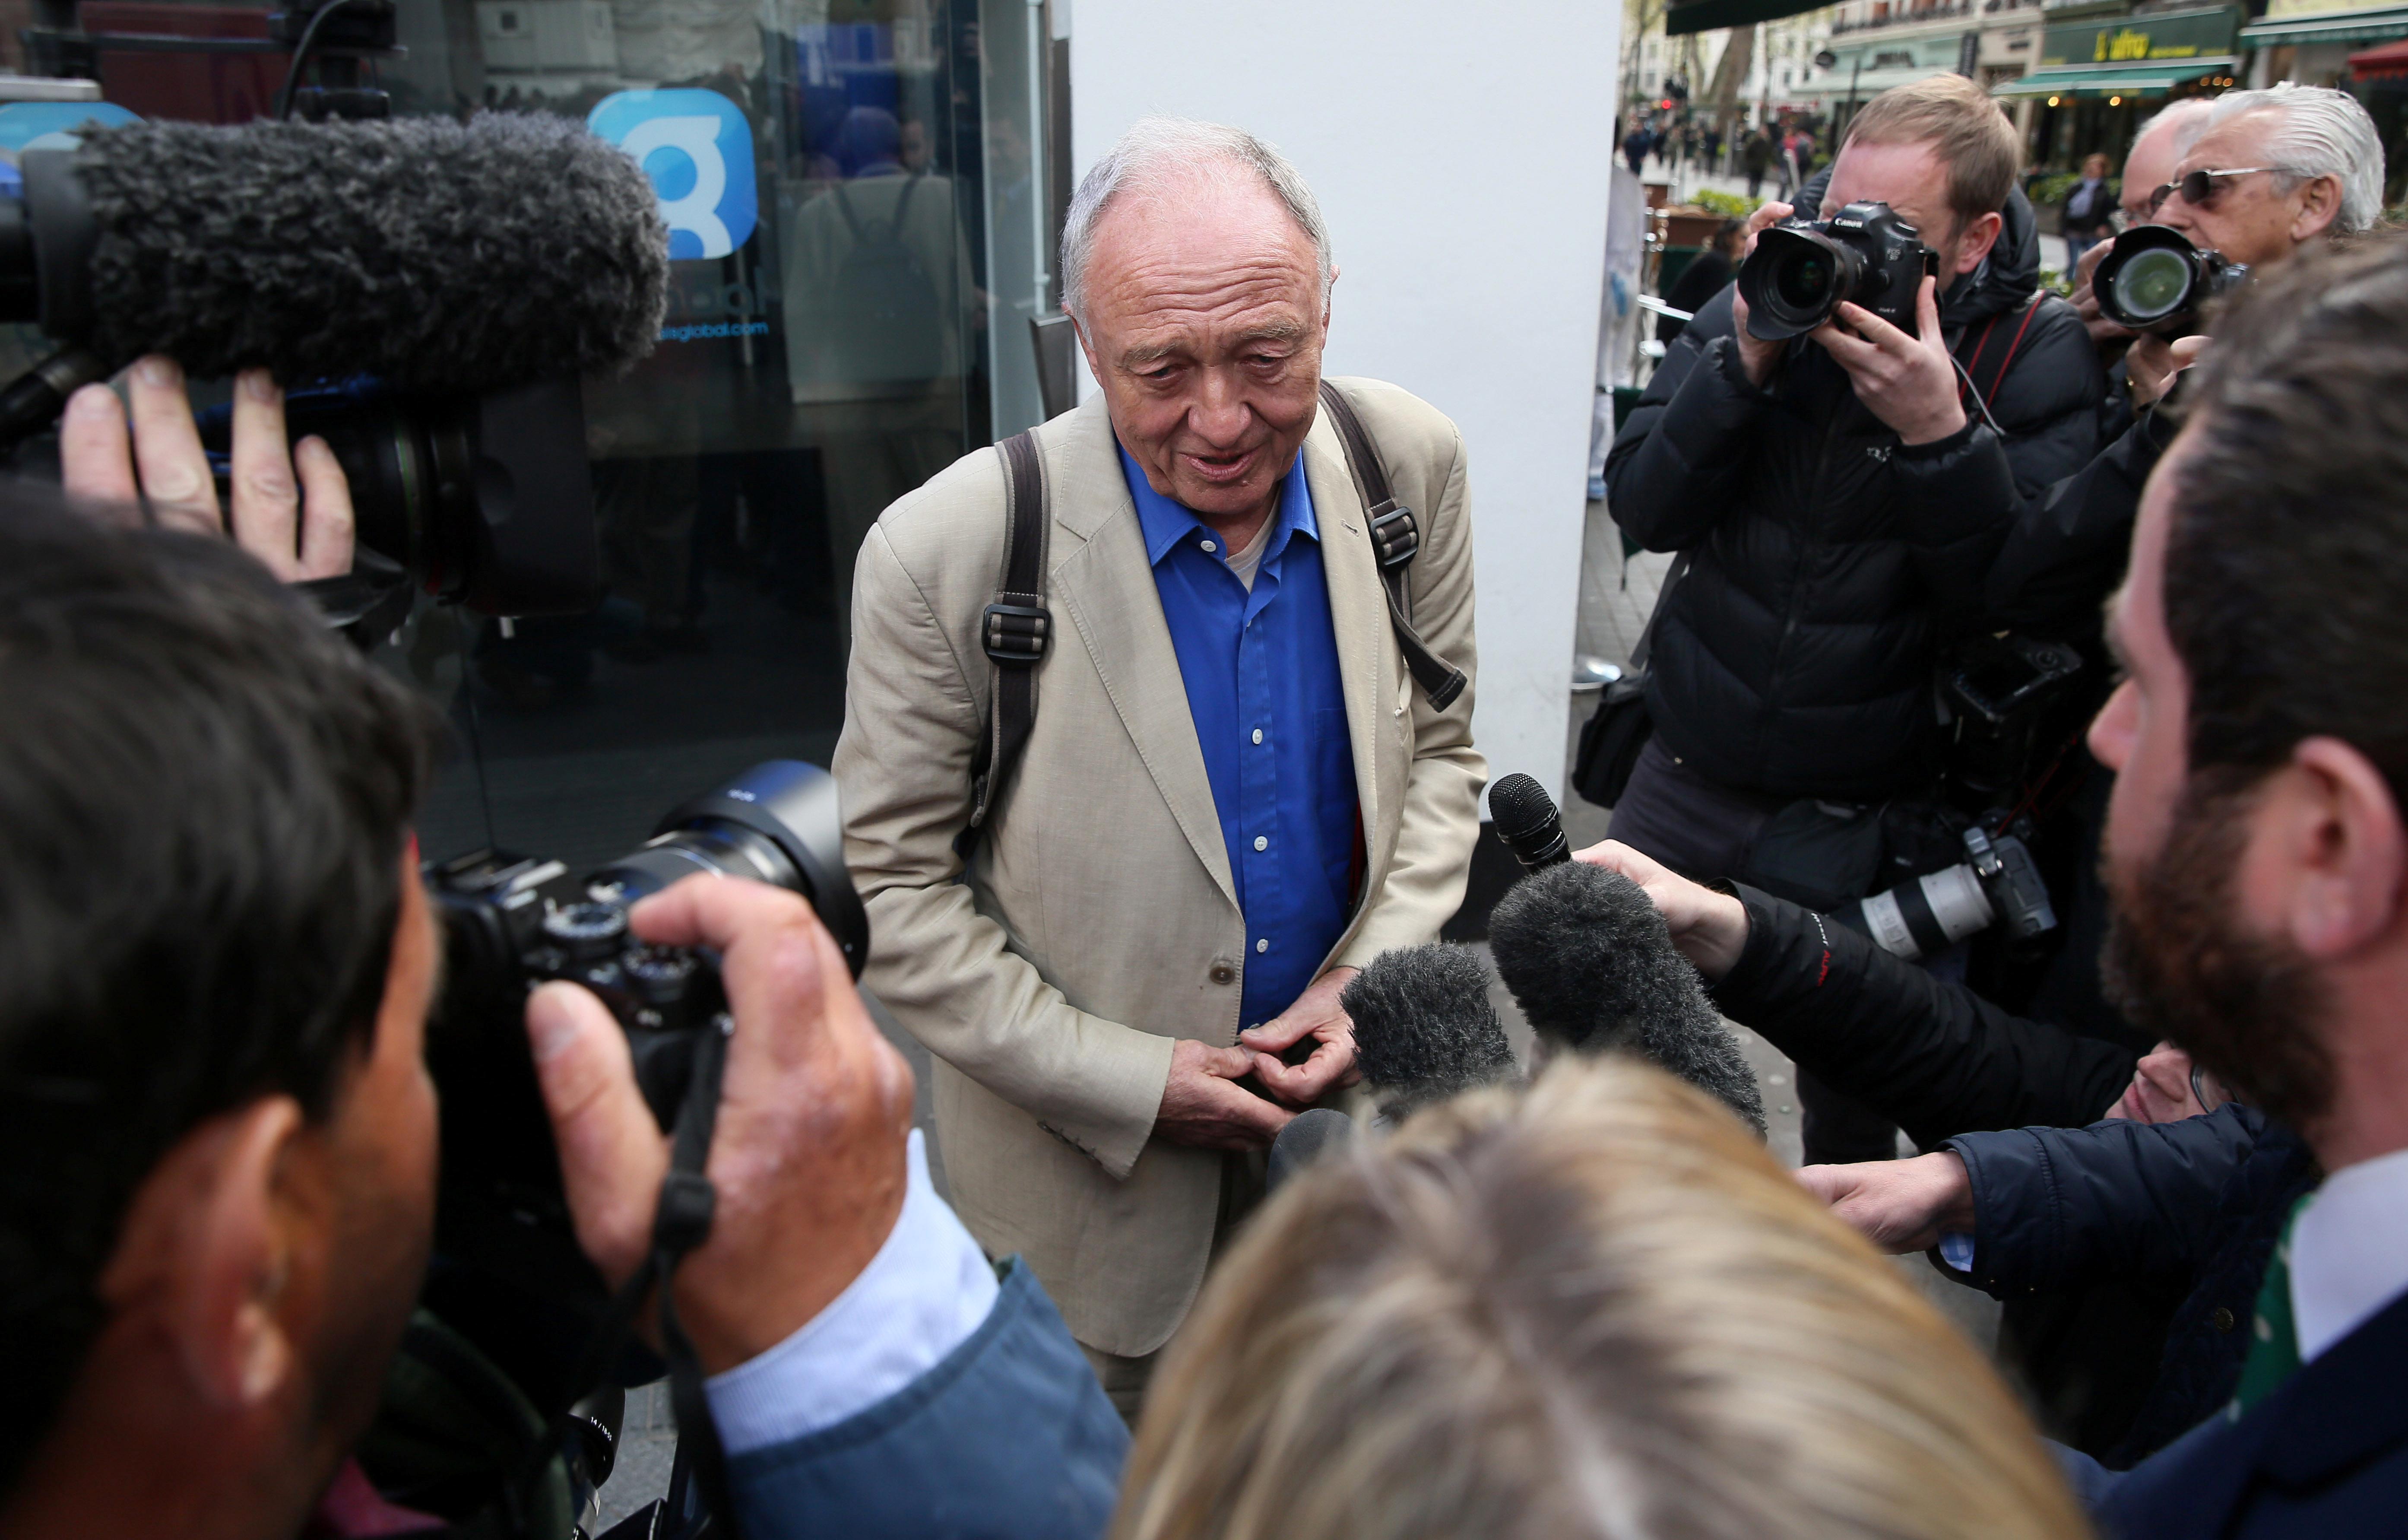 Former London mayor Ken Livingstone speaks to the media in London on April 30, 2016.